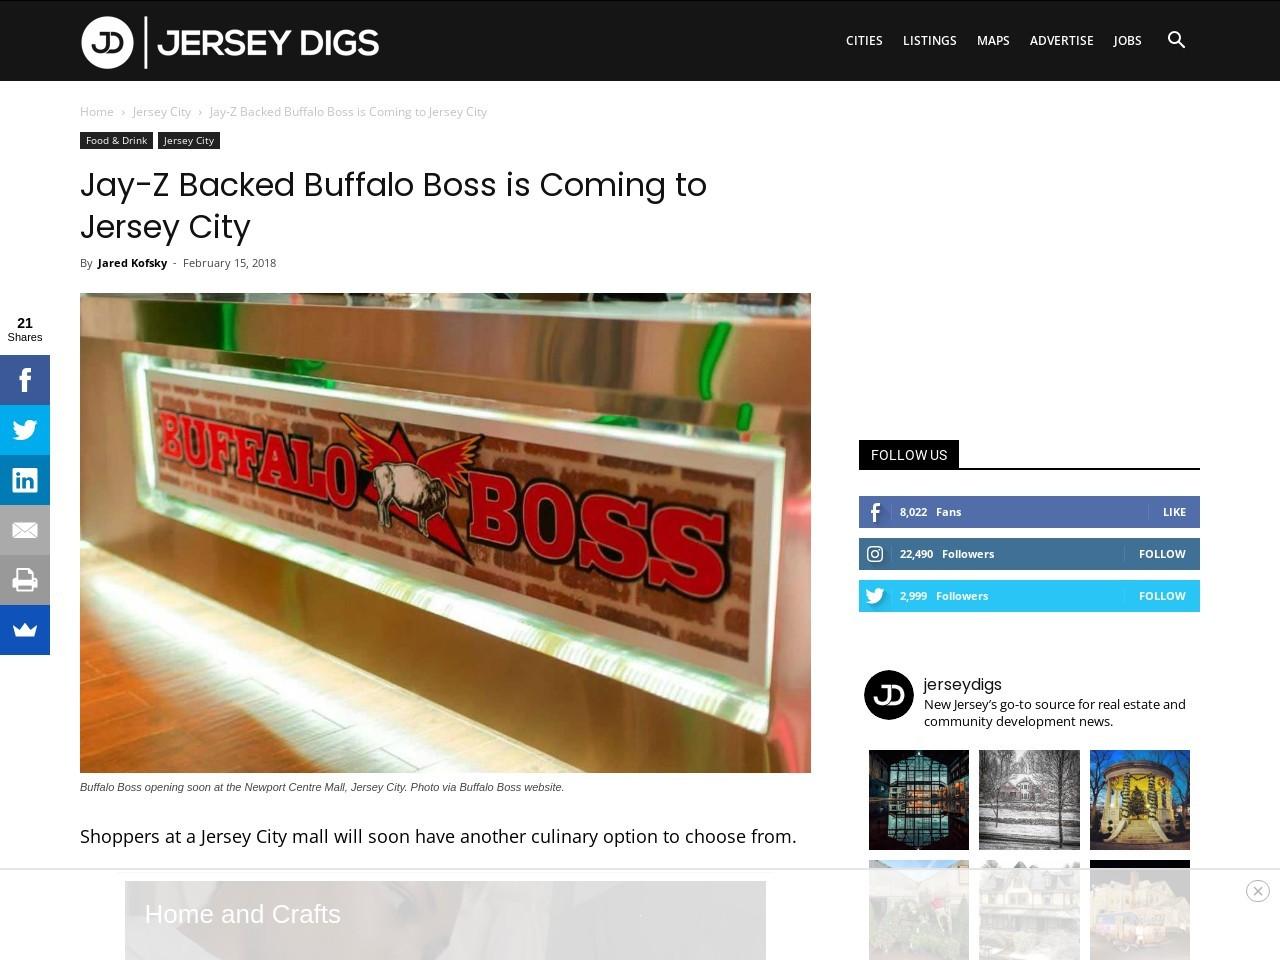 Jay-Z Backed Buffalo Boss is Coming to Jersey City